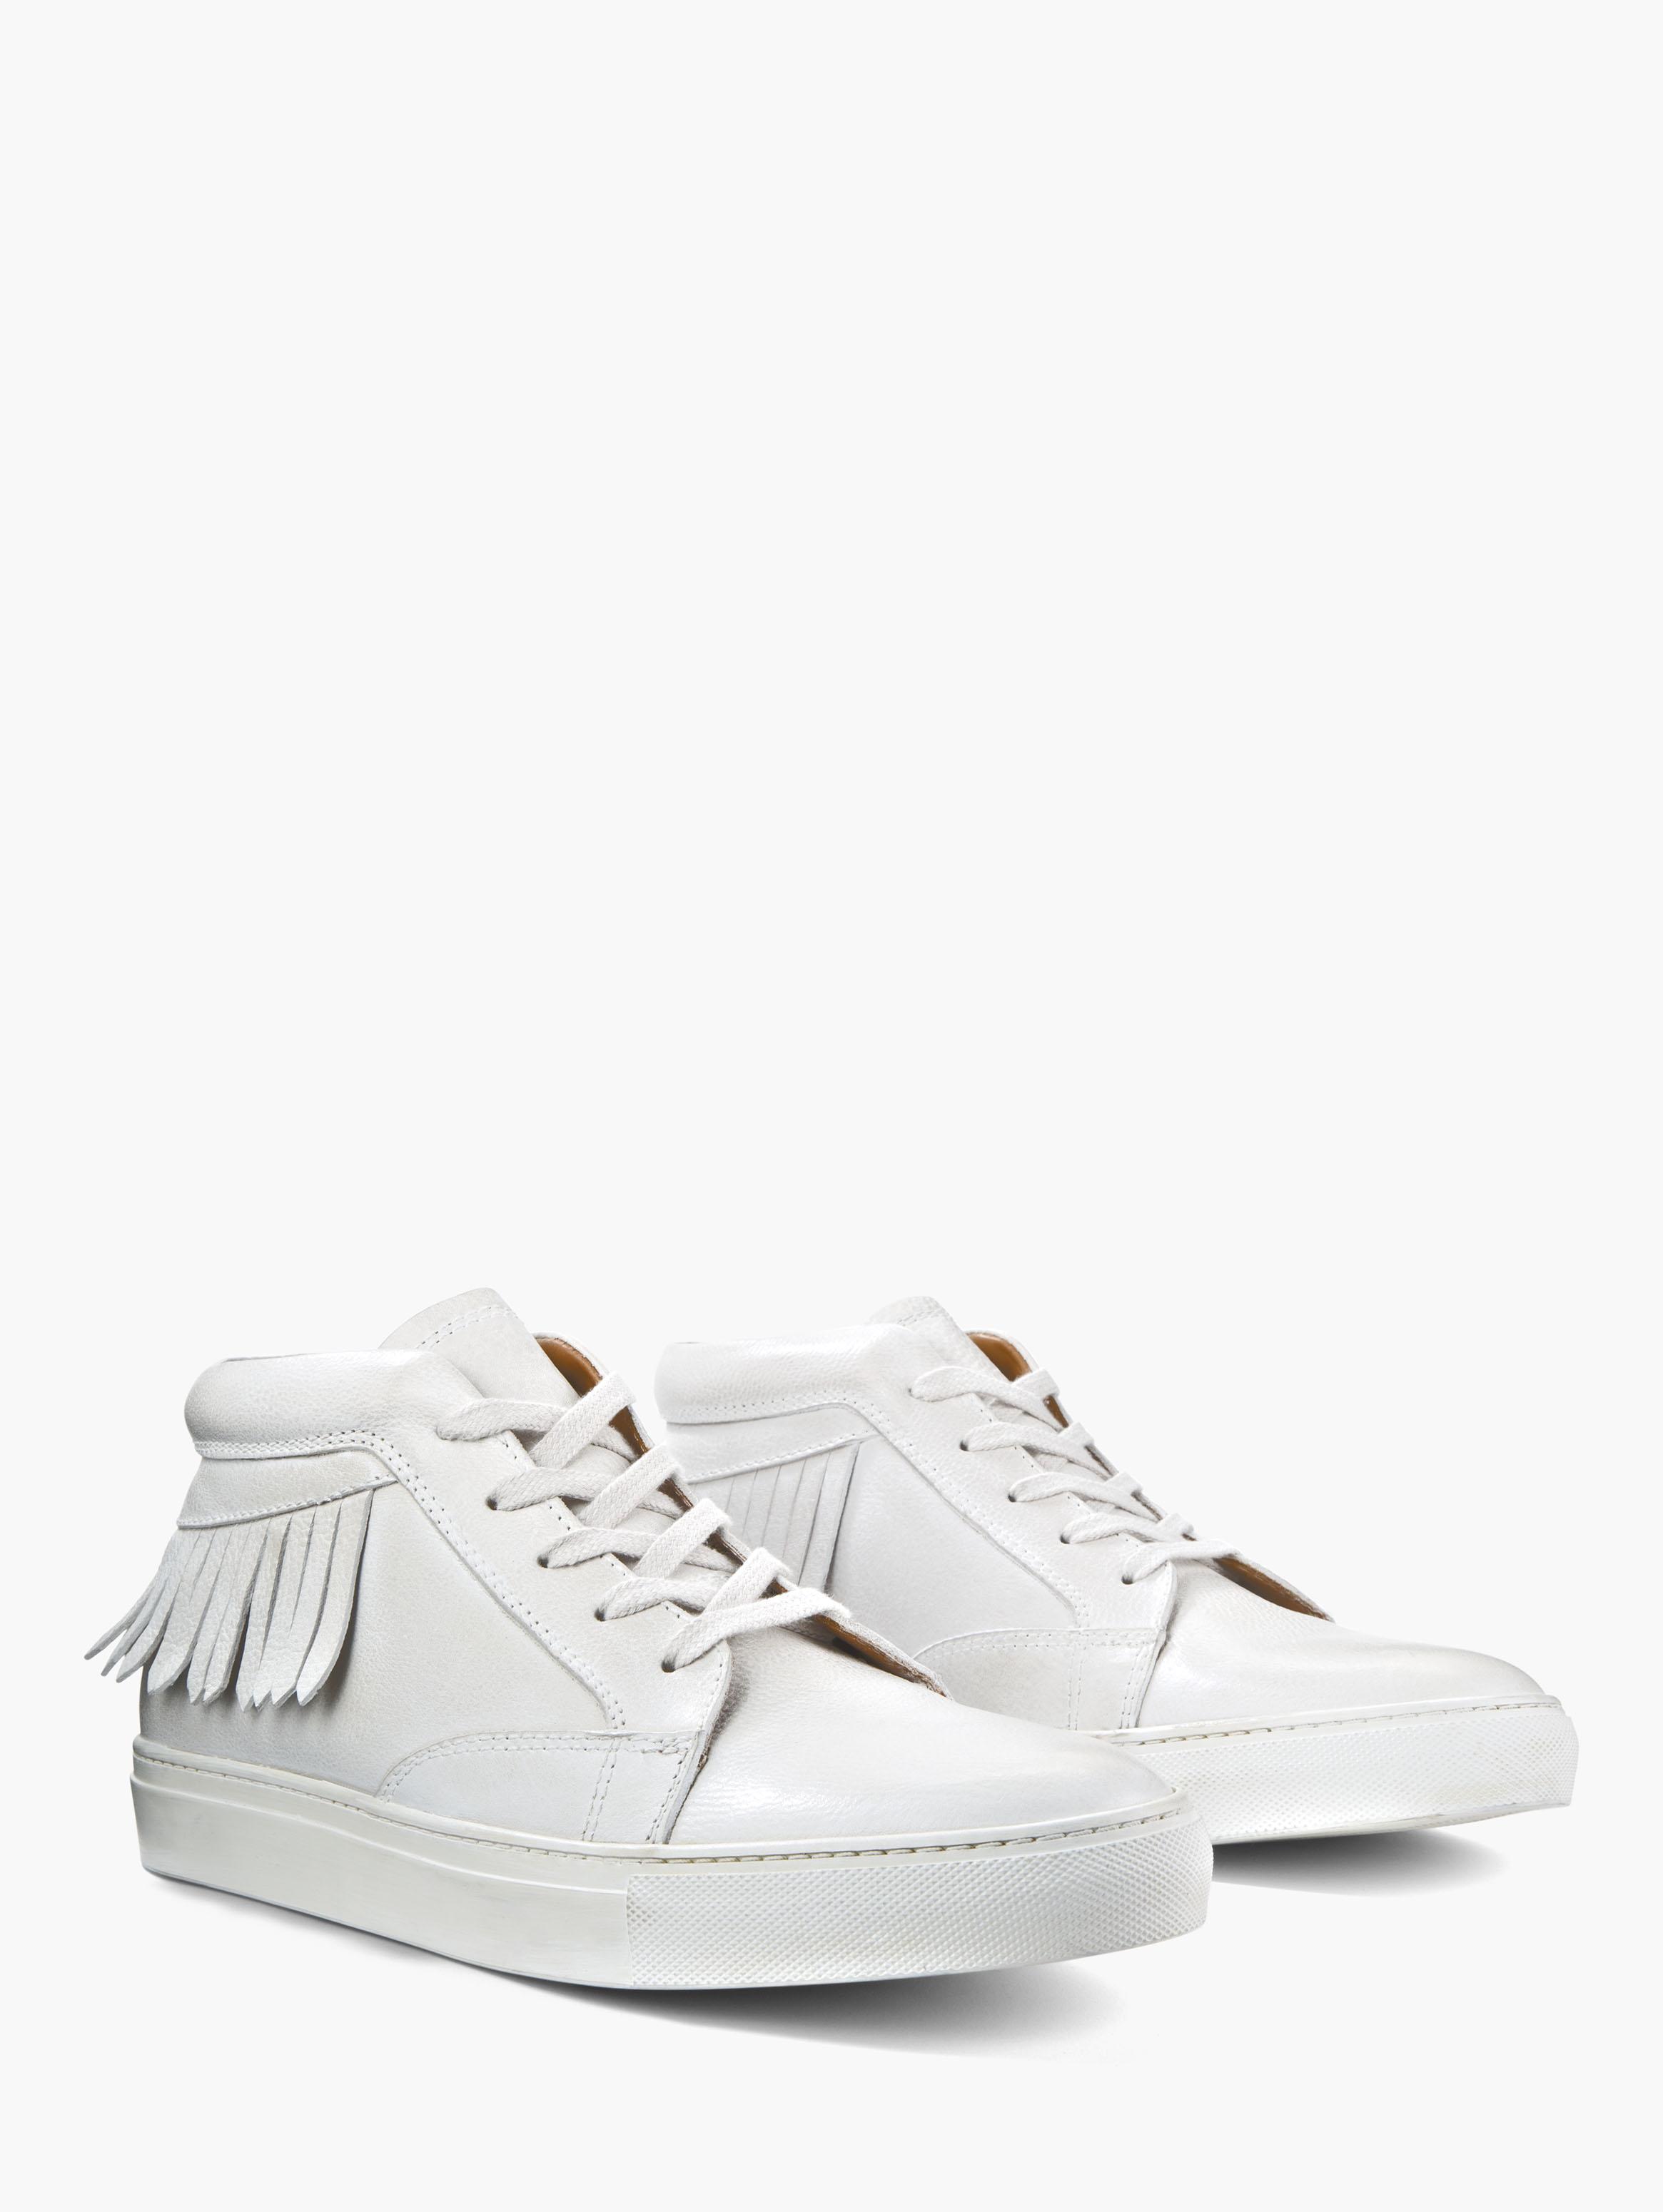 John Varvatos Reed Fringe Mid Top Sneaker Bone White Size: 9 pyKxpwtJE